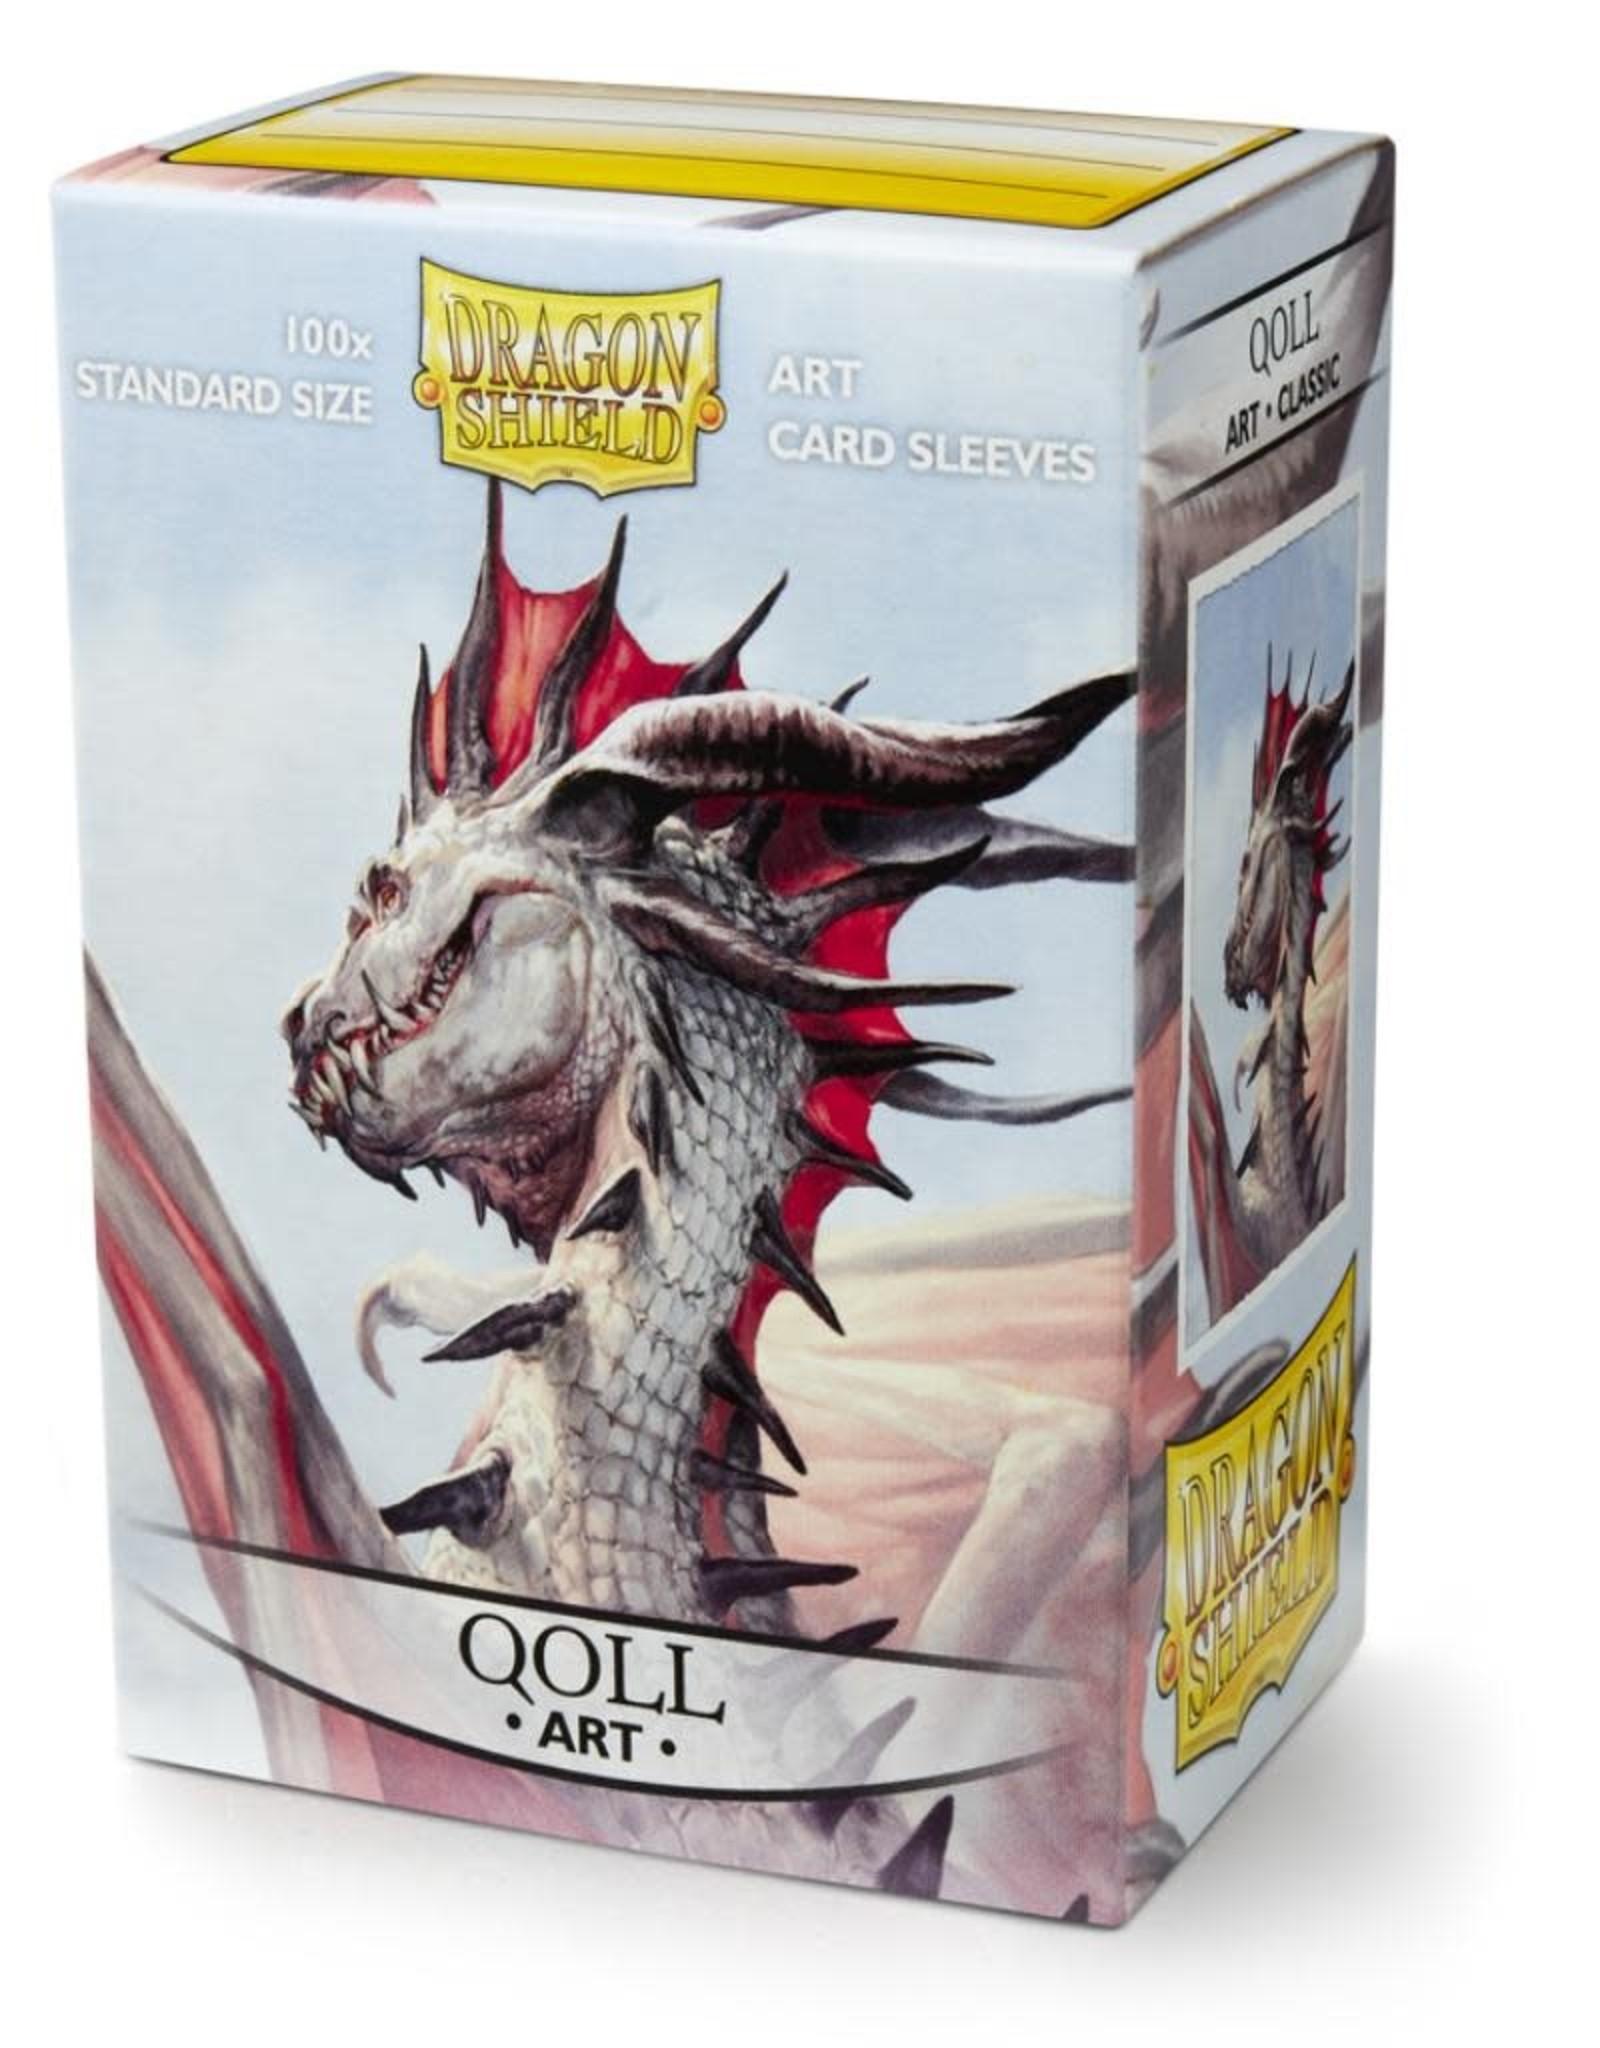 Dragon Shield Qoll - Full Art